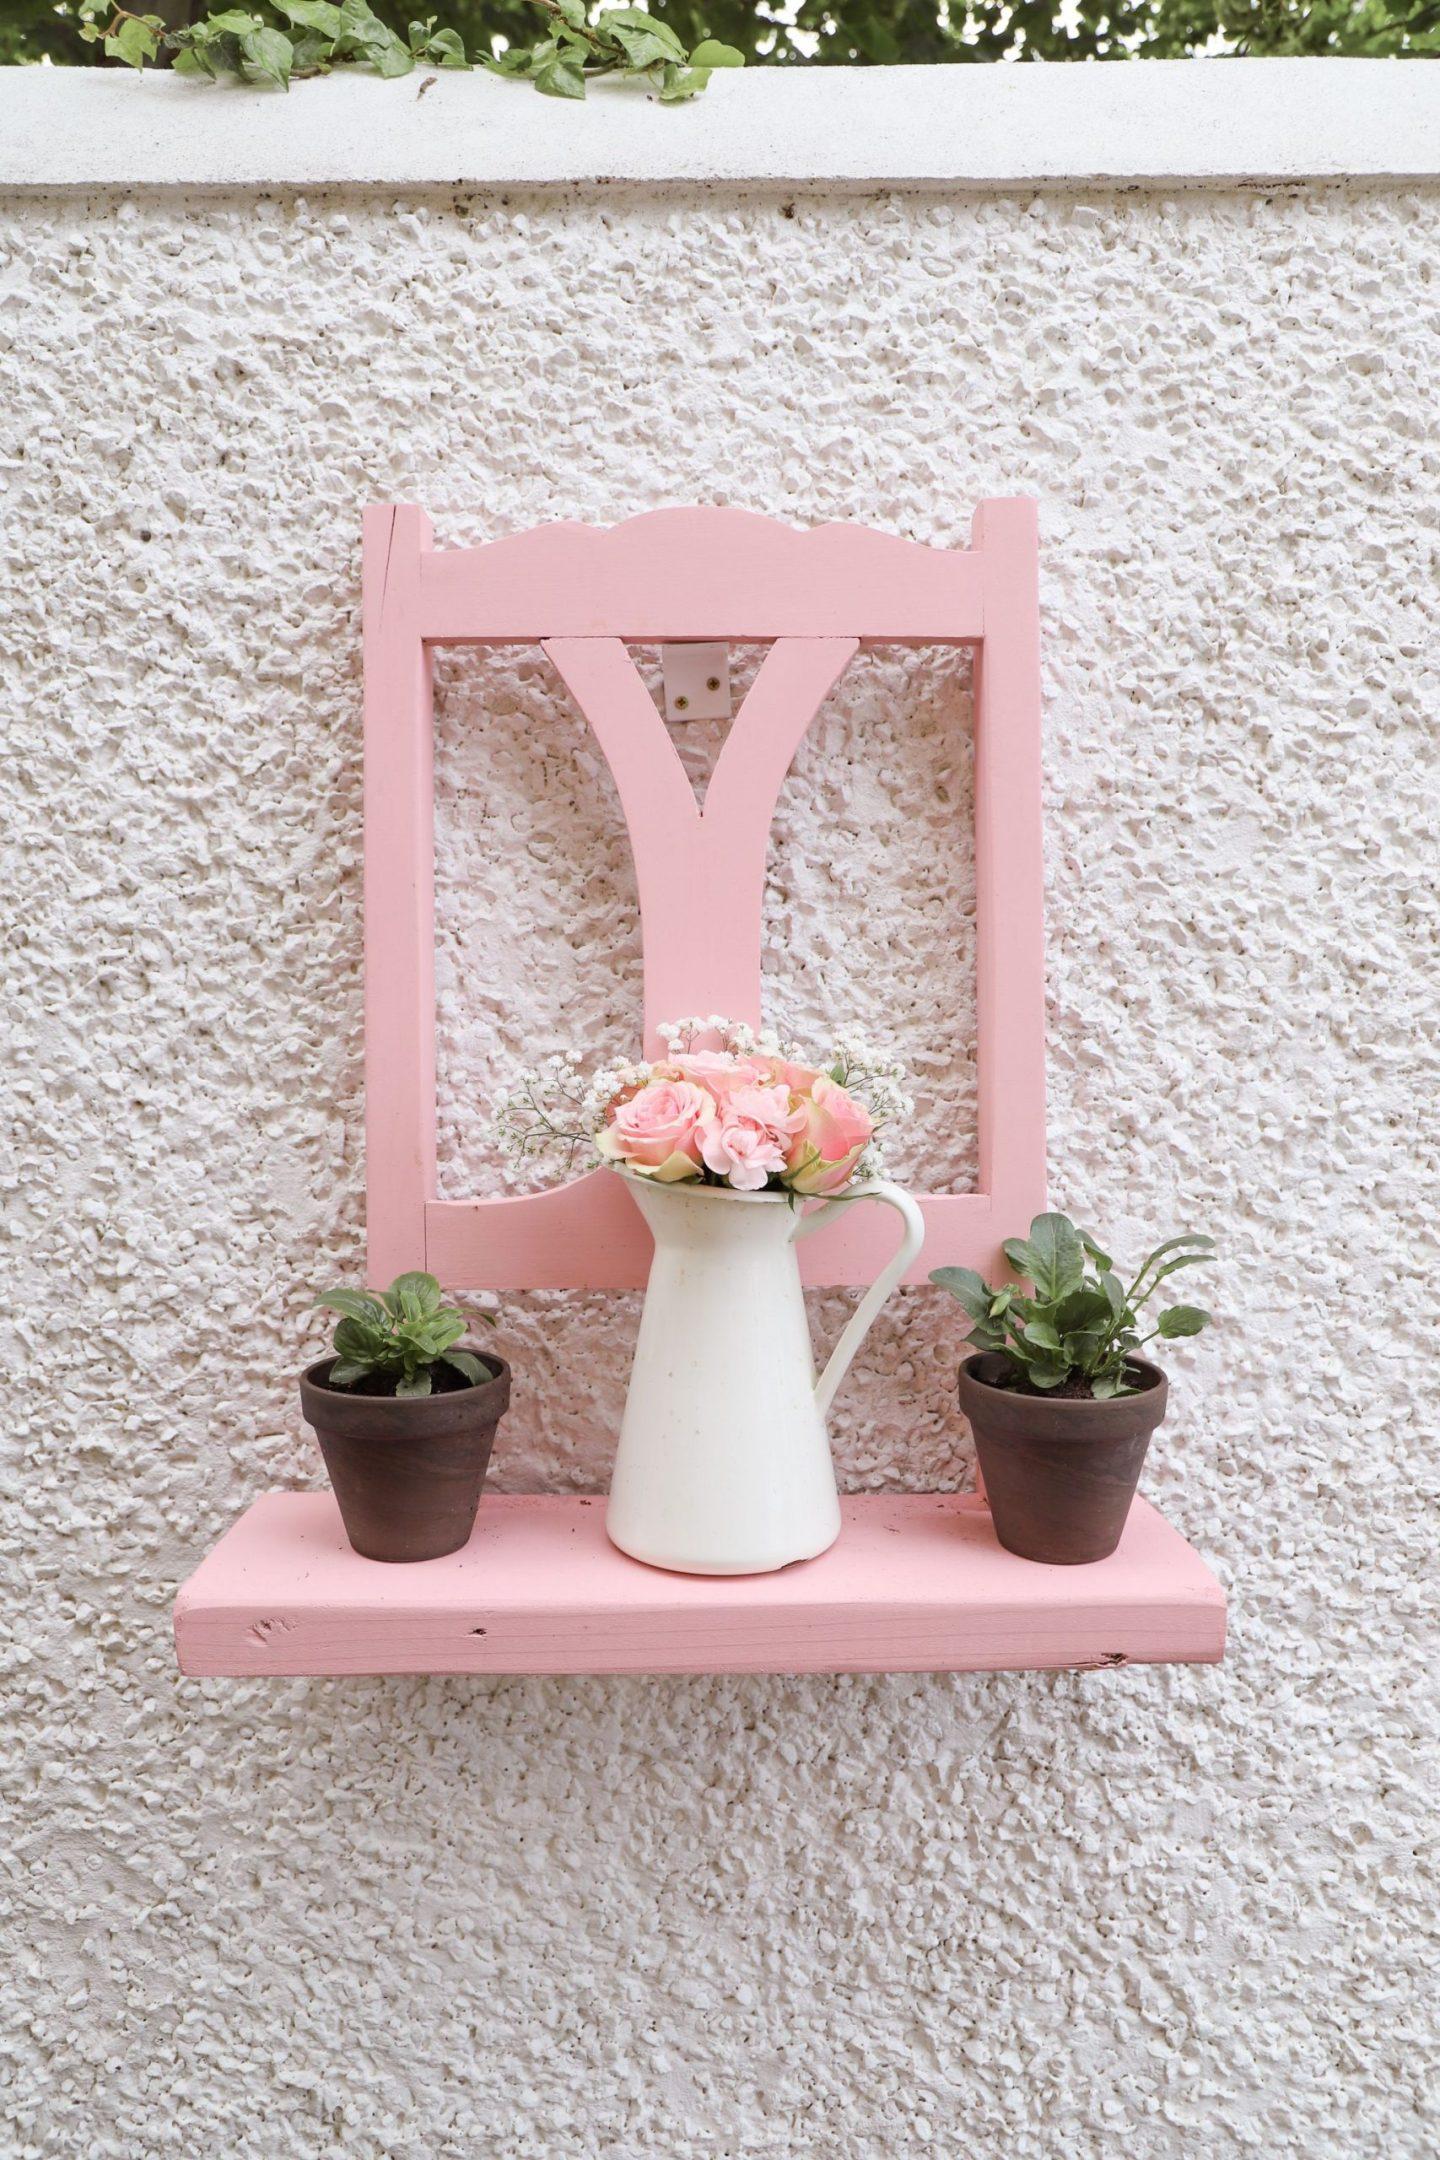 DIY shelf made from chair